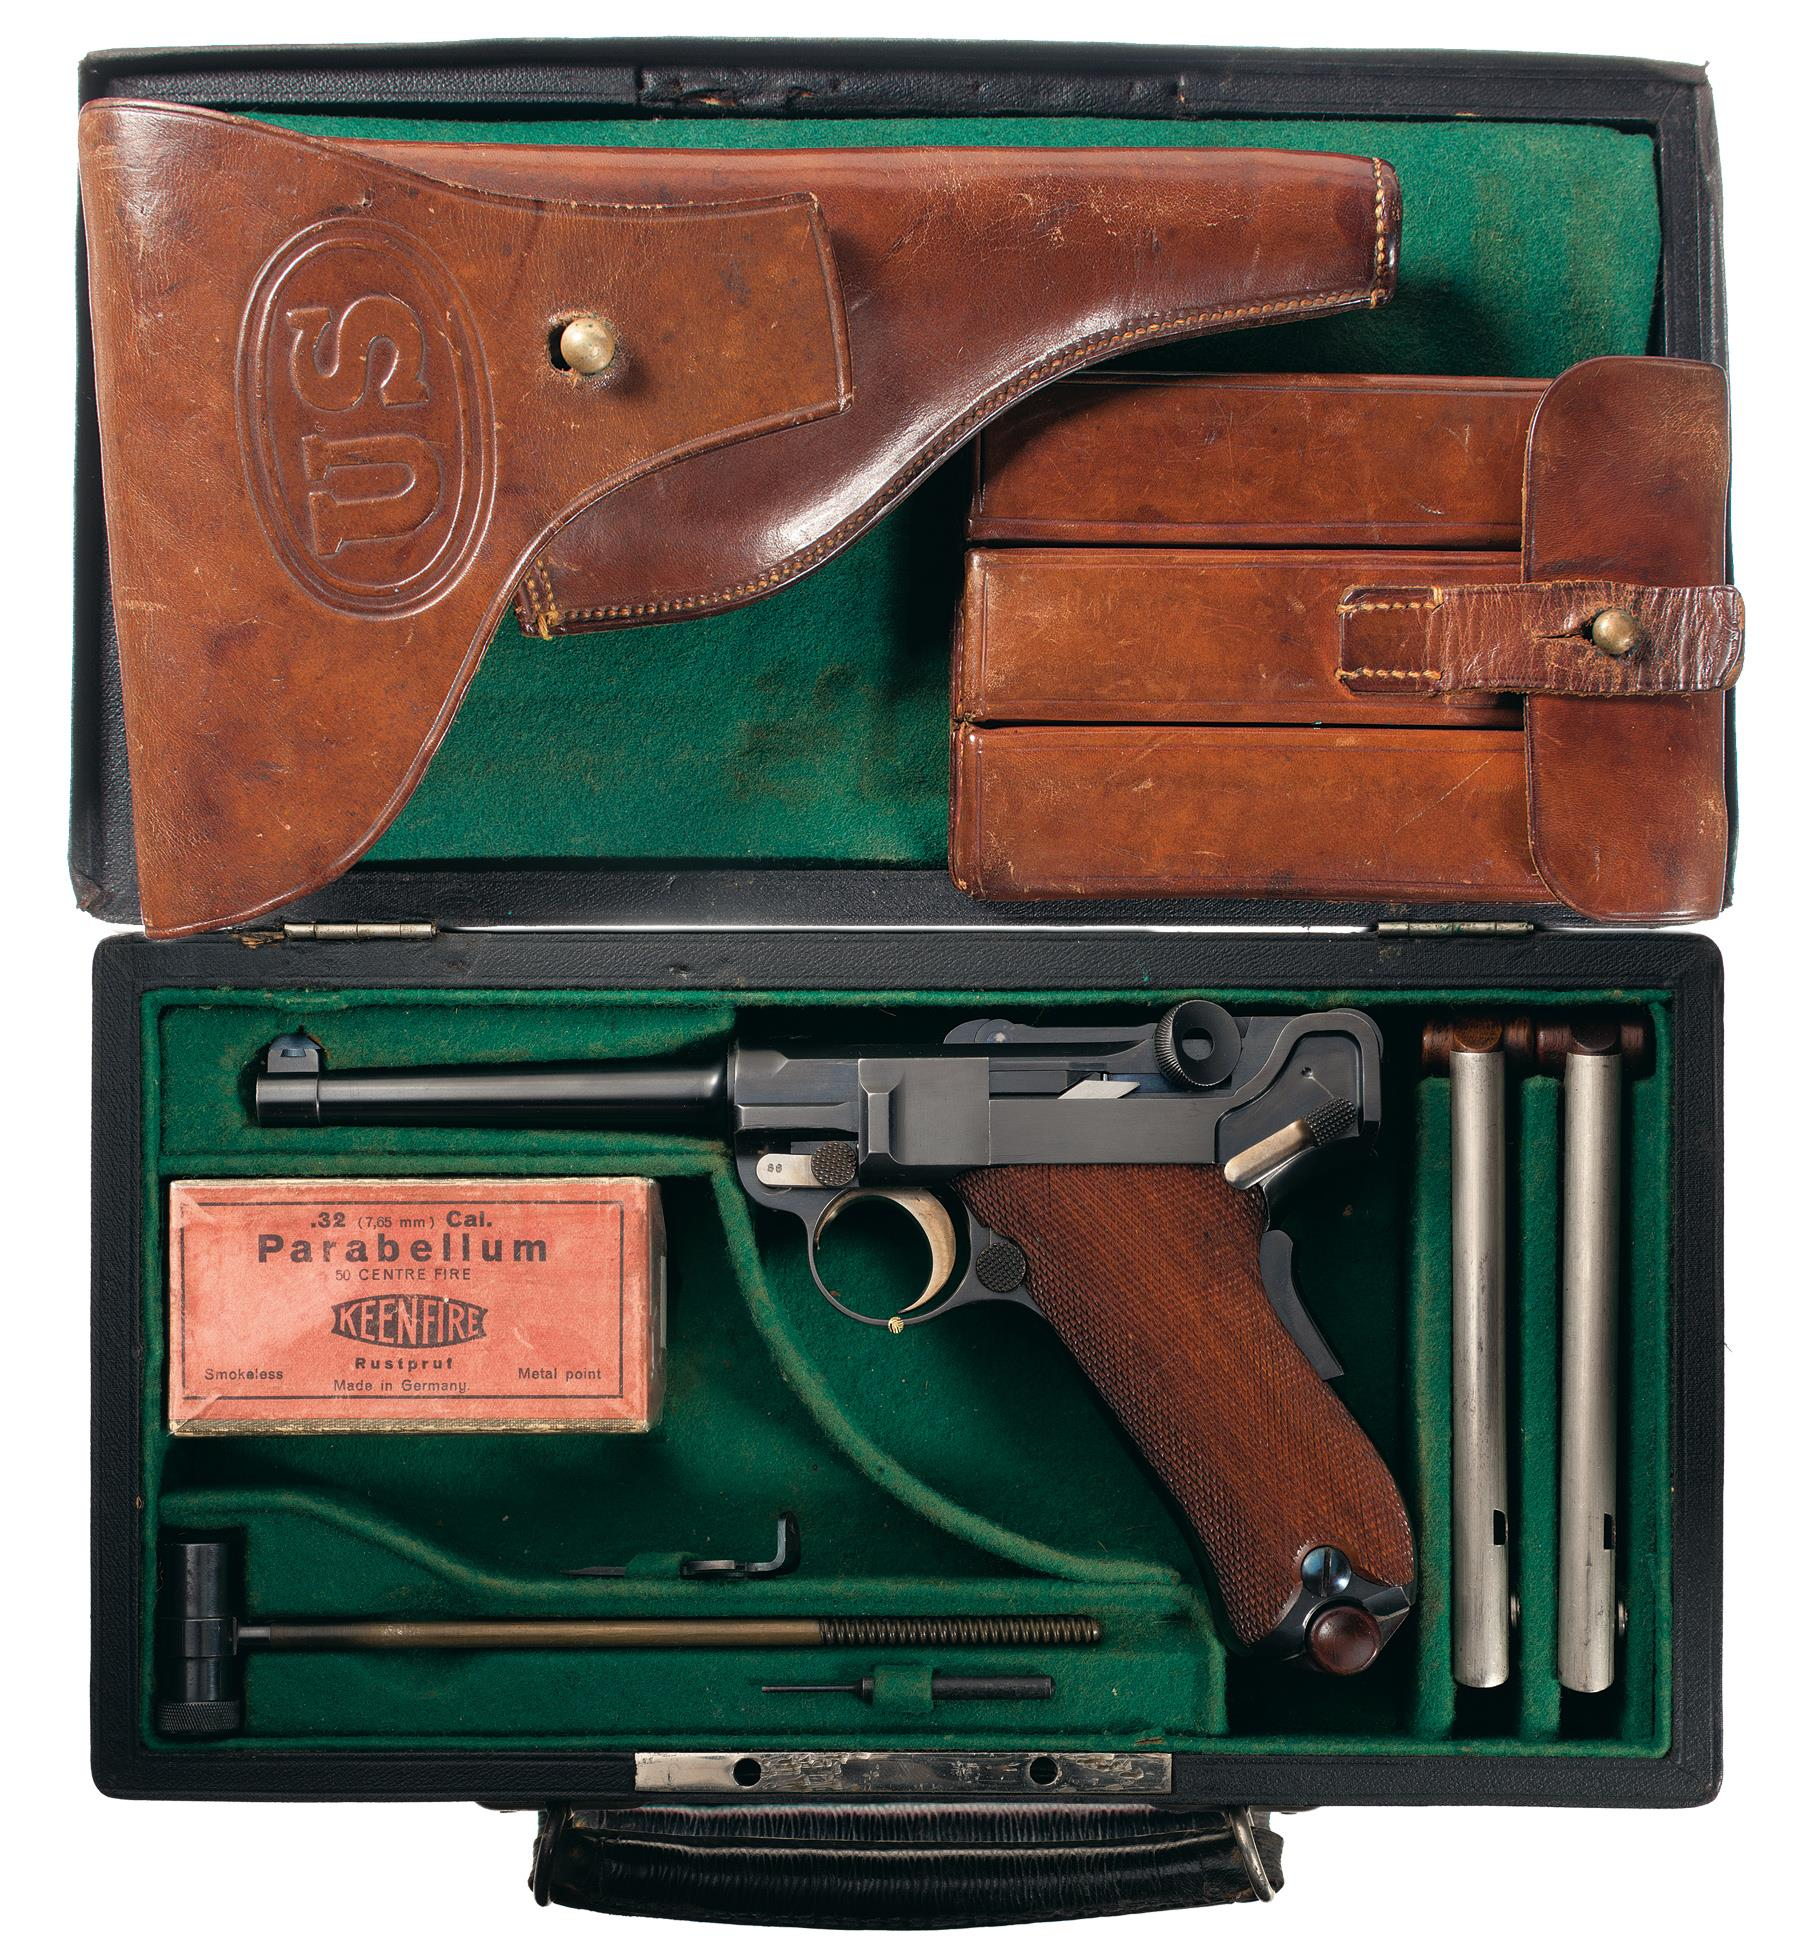 DWM 1900 Pistol 7 65 mm Luger Auto